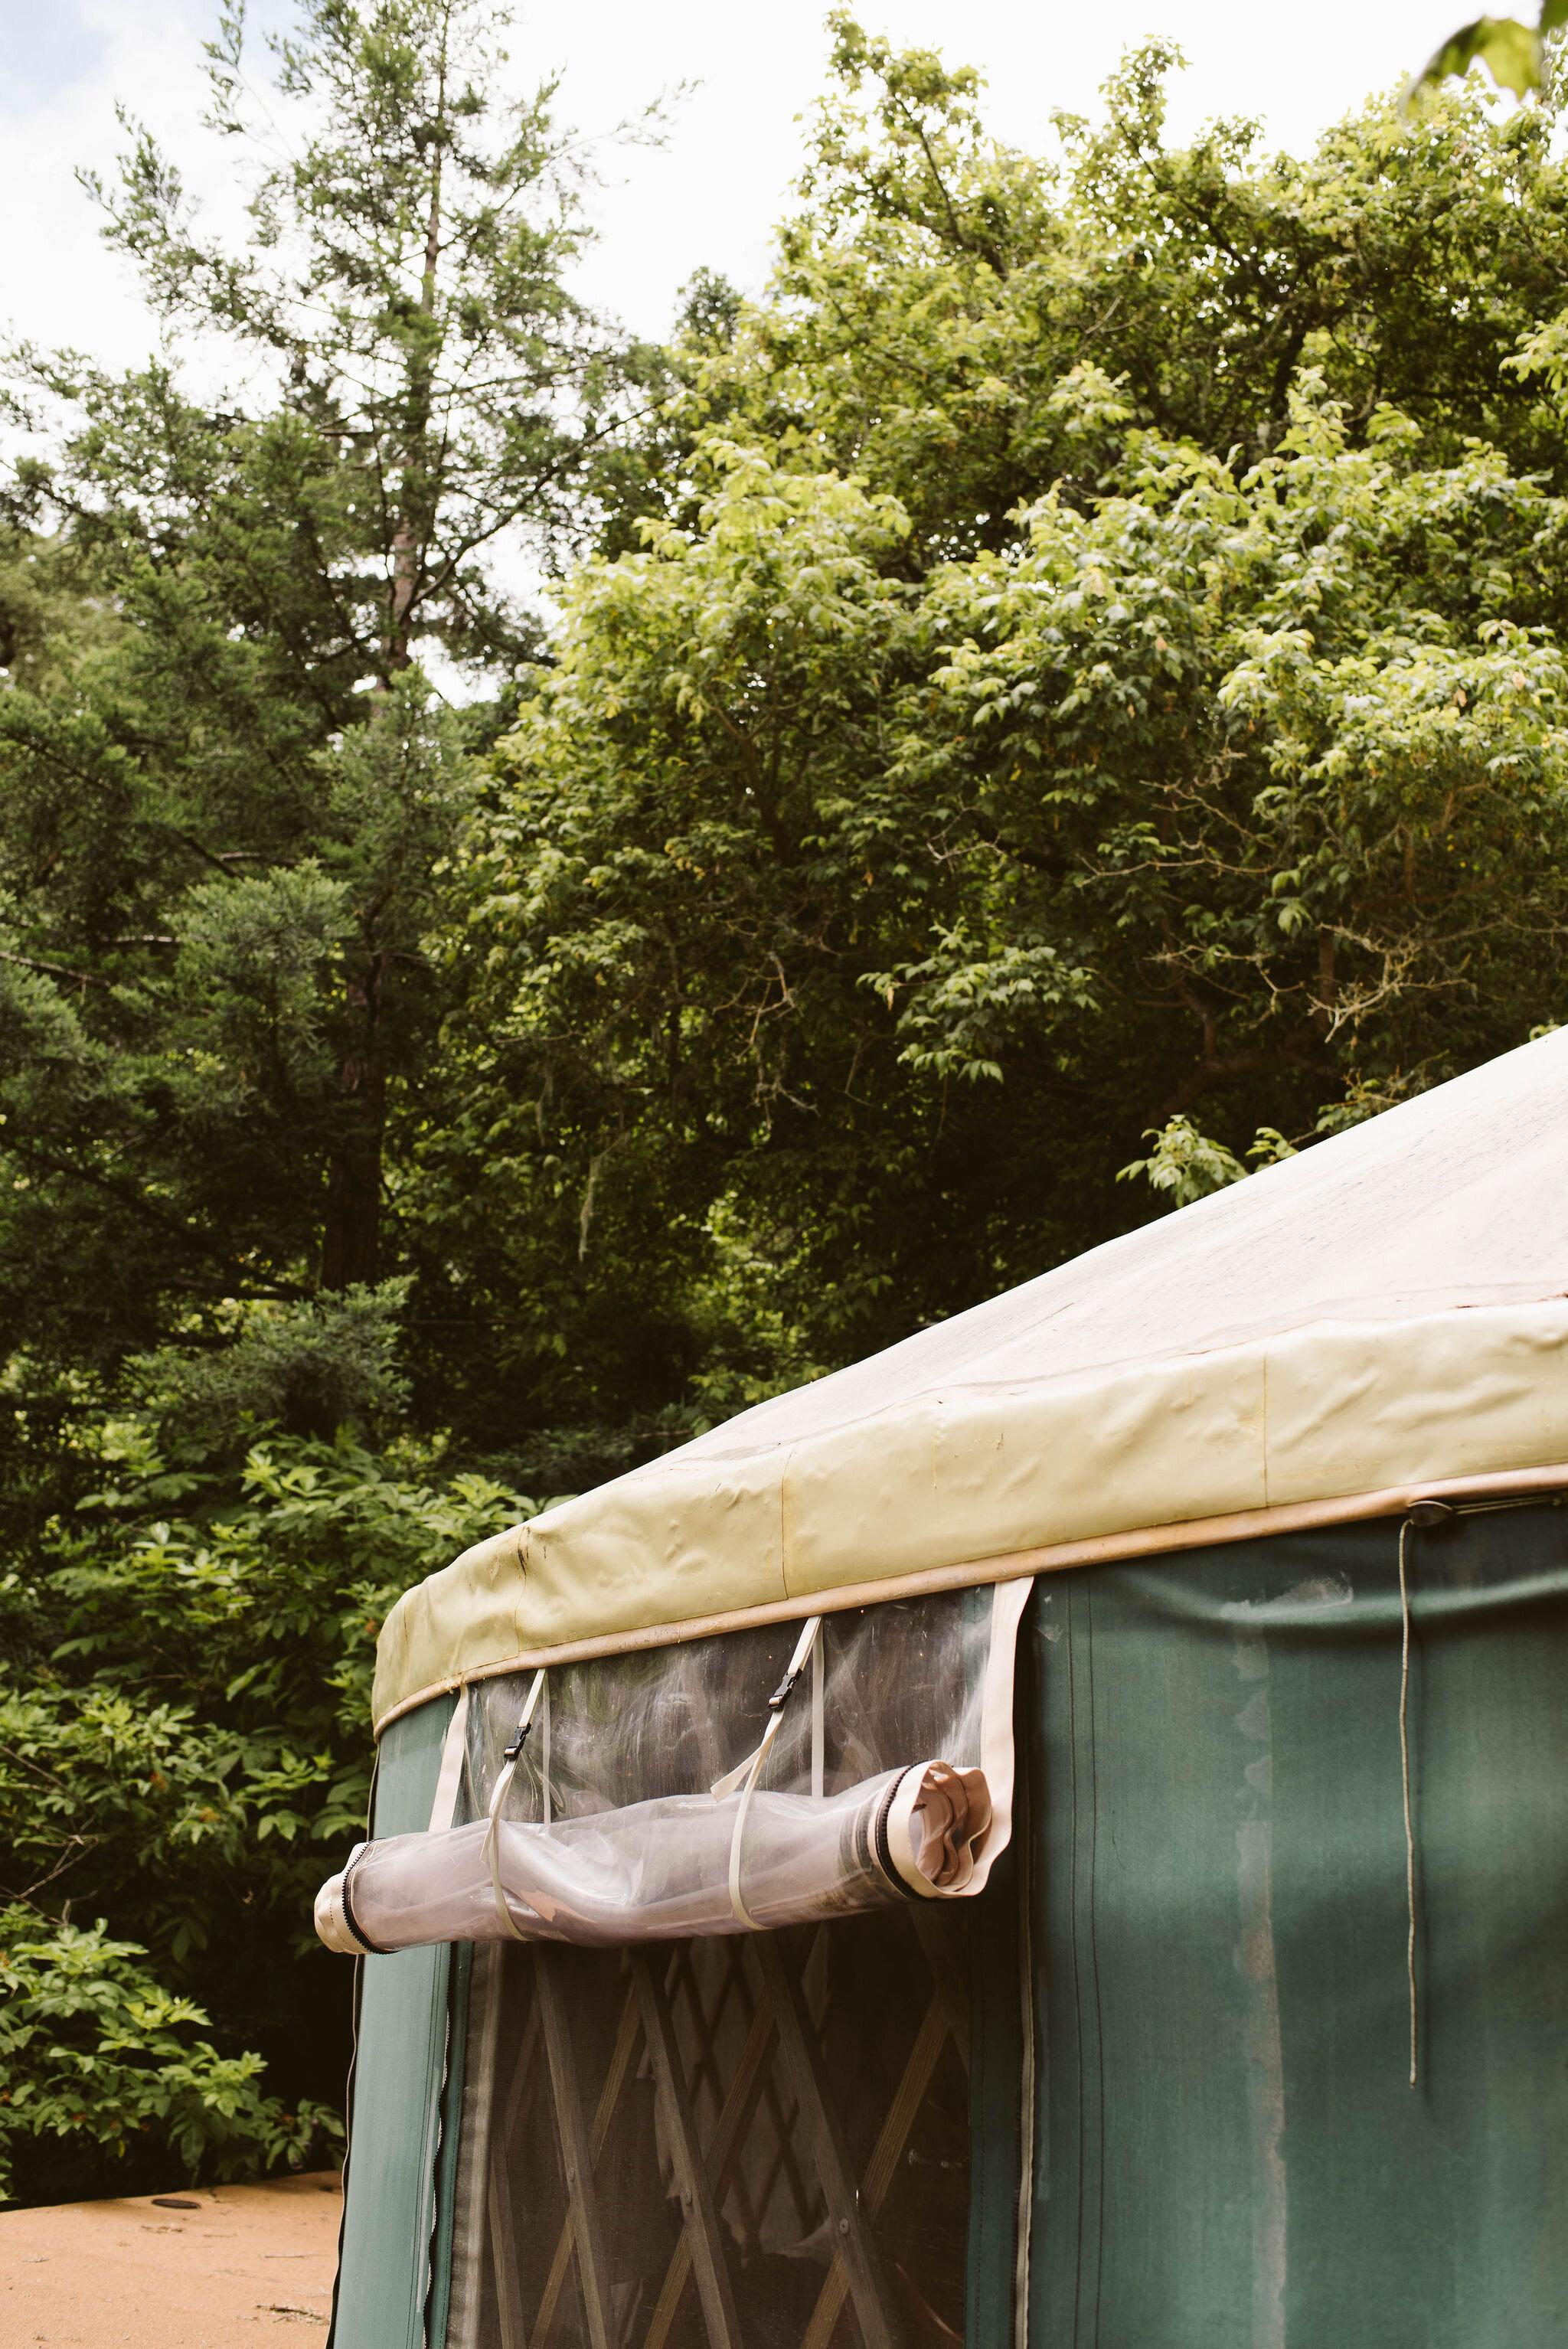 Venture-Retreat-Center-Wedding-Pescadero-Sat-Aaron-Pritam-The-Shalom-Imaginative-62.jpg